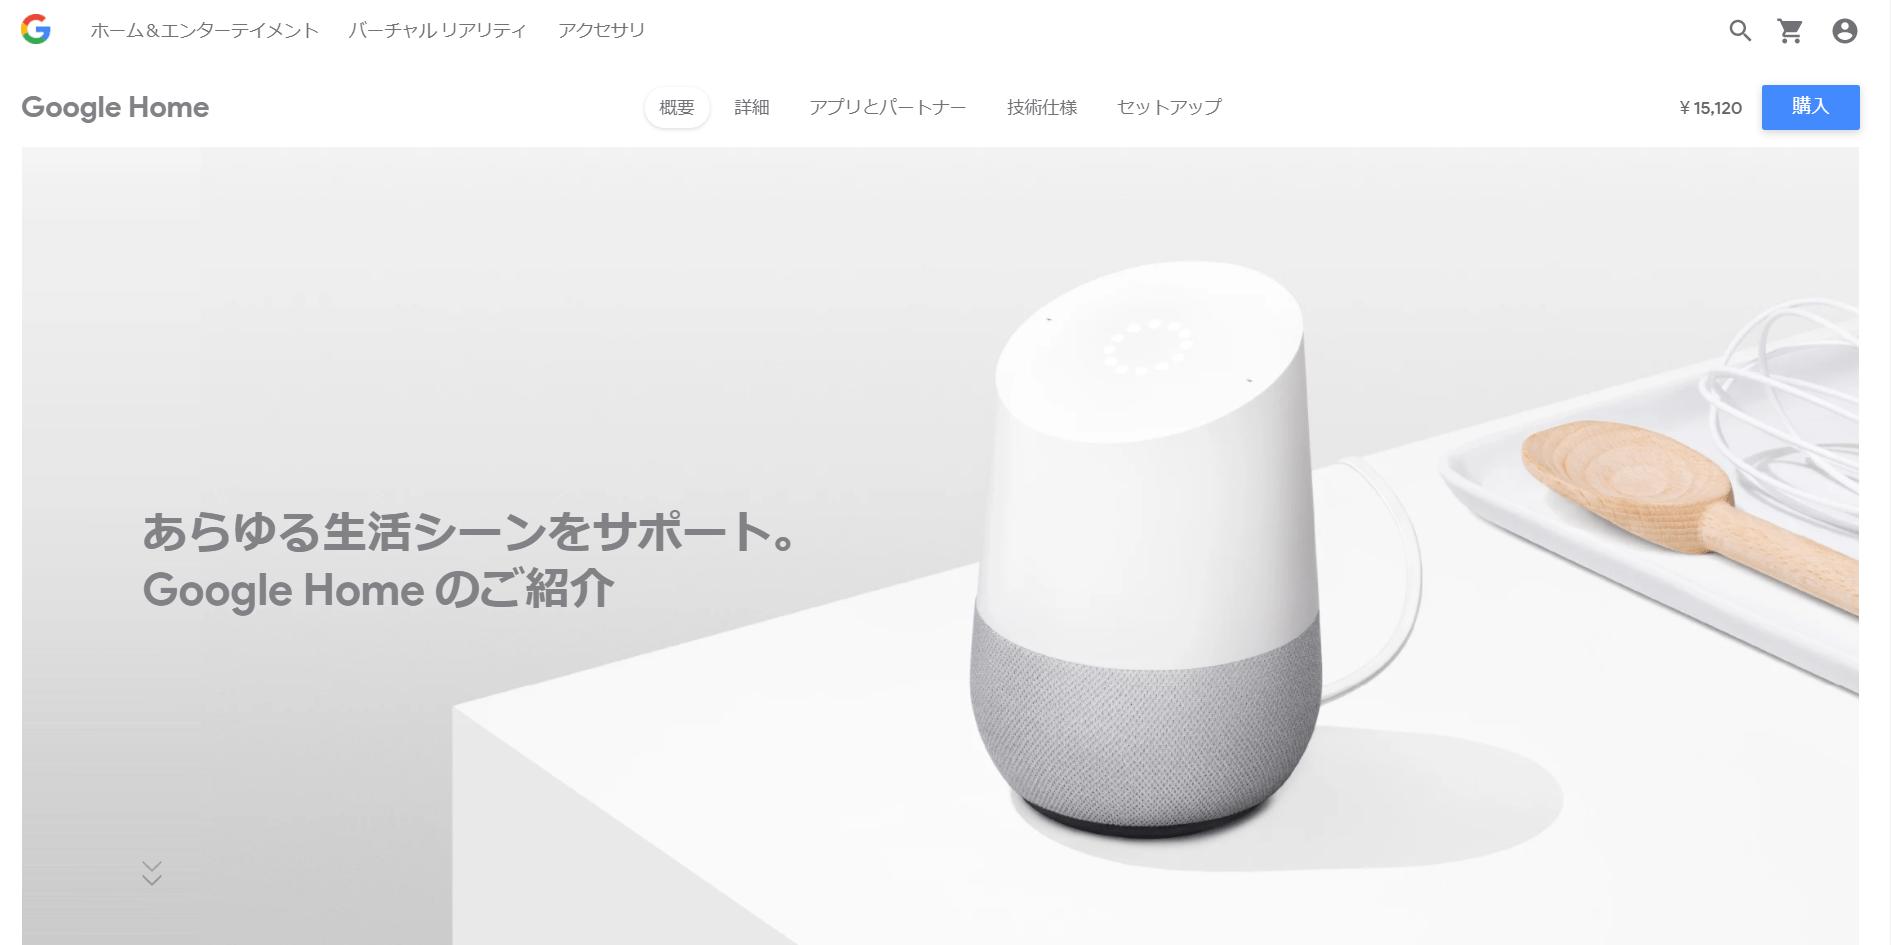 google-home-%e7%94%bb%e5%83%8f